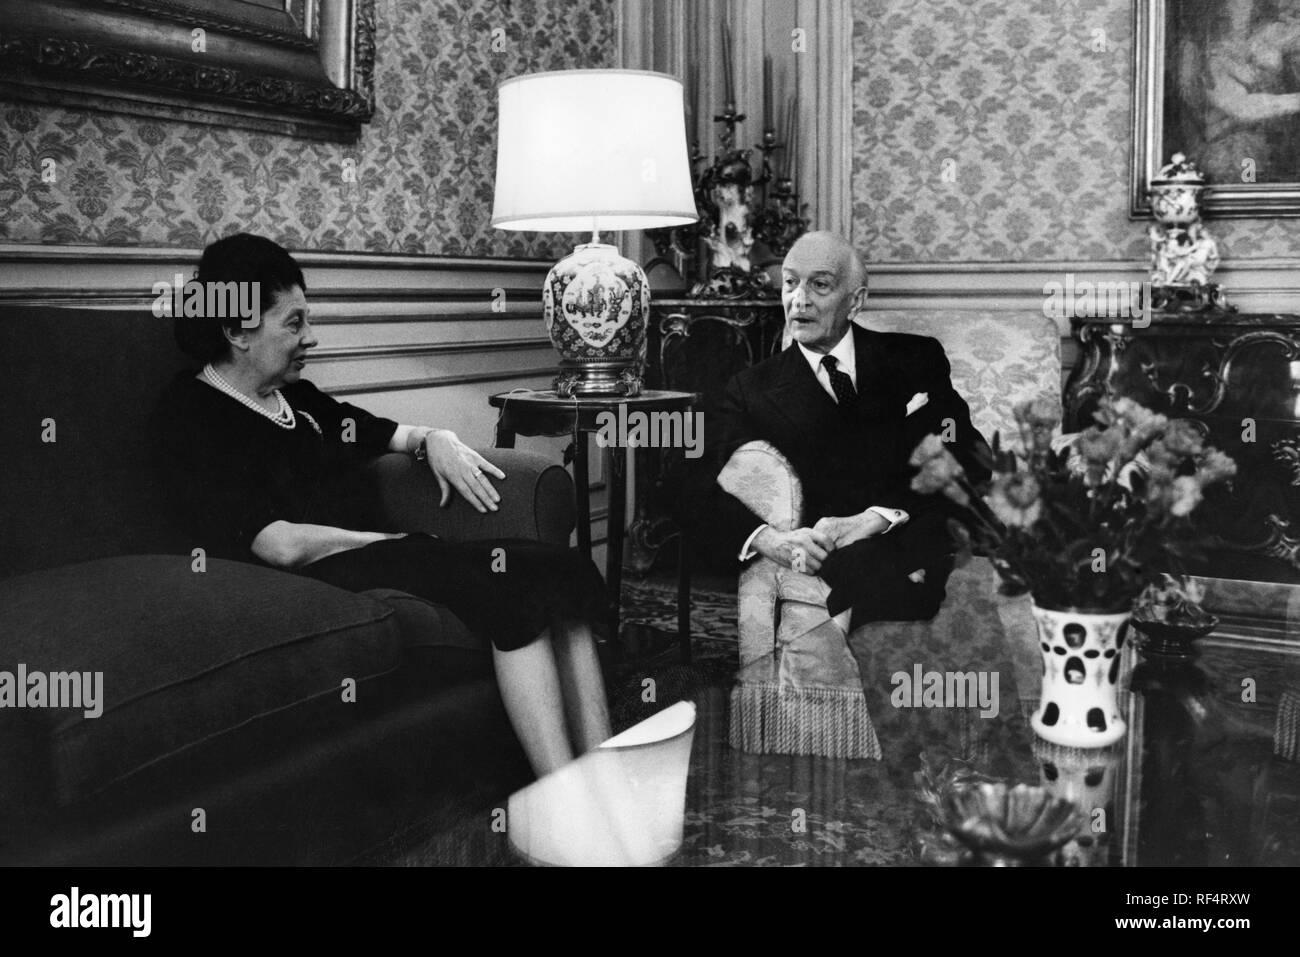 antonio segni president of republic with his wife, 1963 Stock Photo